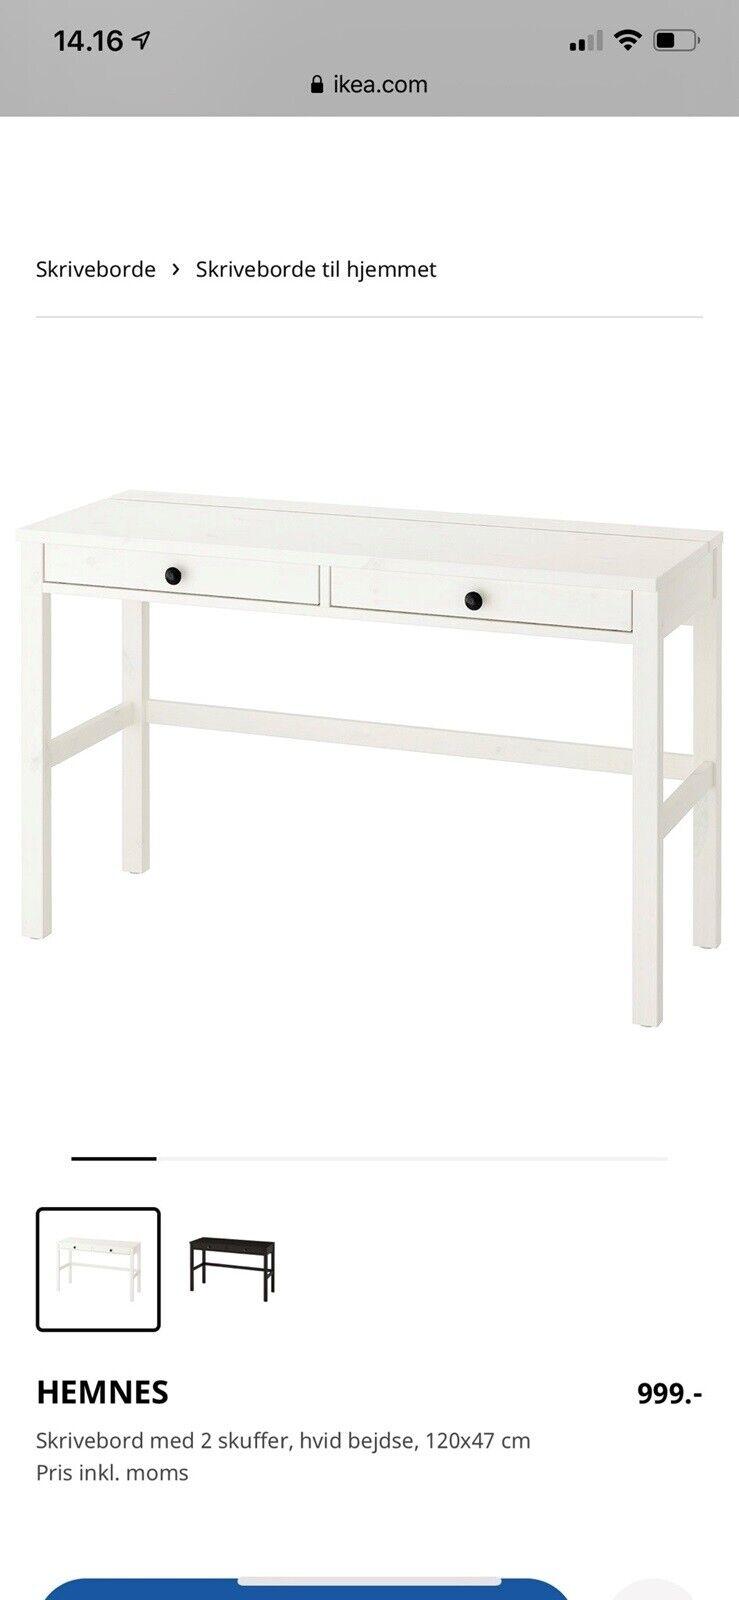 Hemnes Skrivebord Med 2 Skuffer Sortbrun 120x47 Cm Ikea